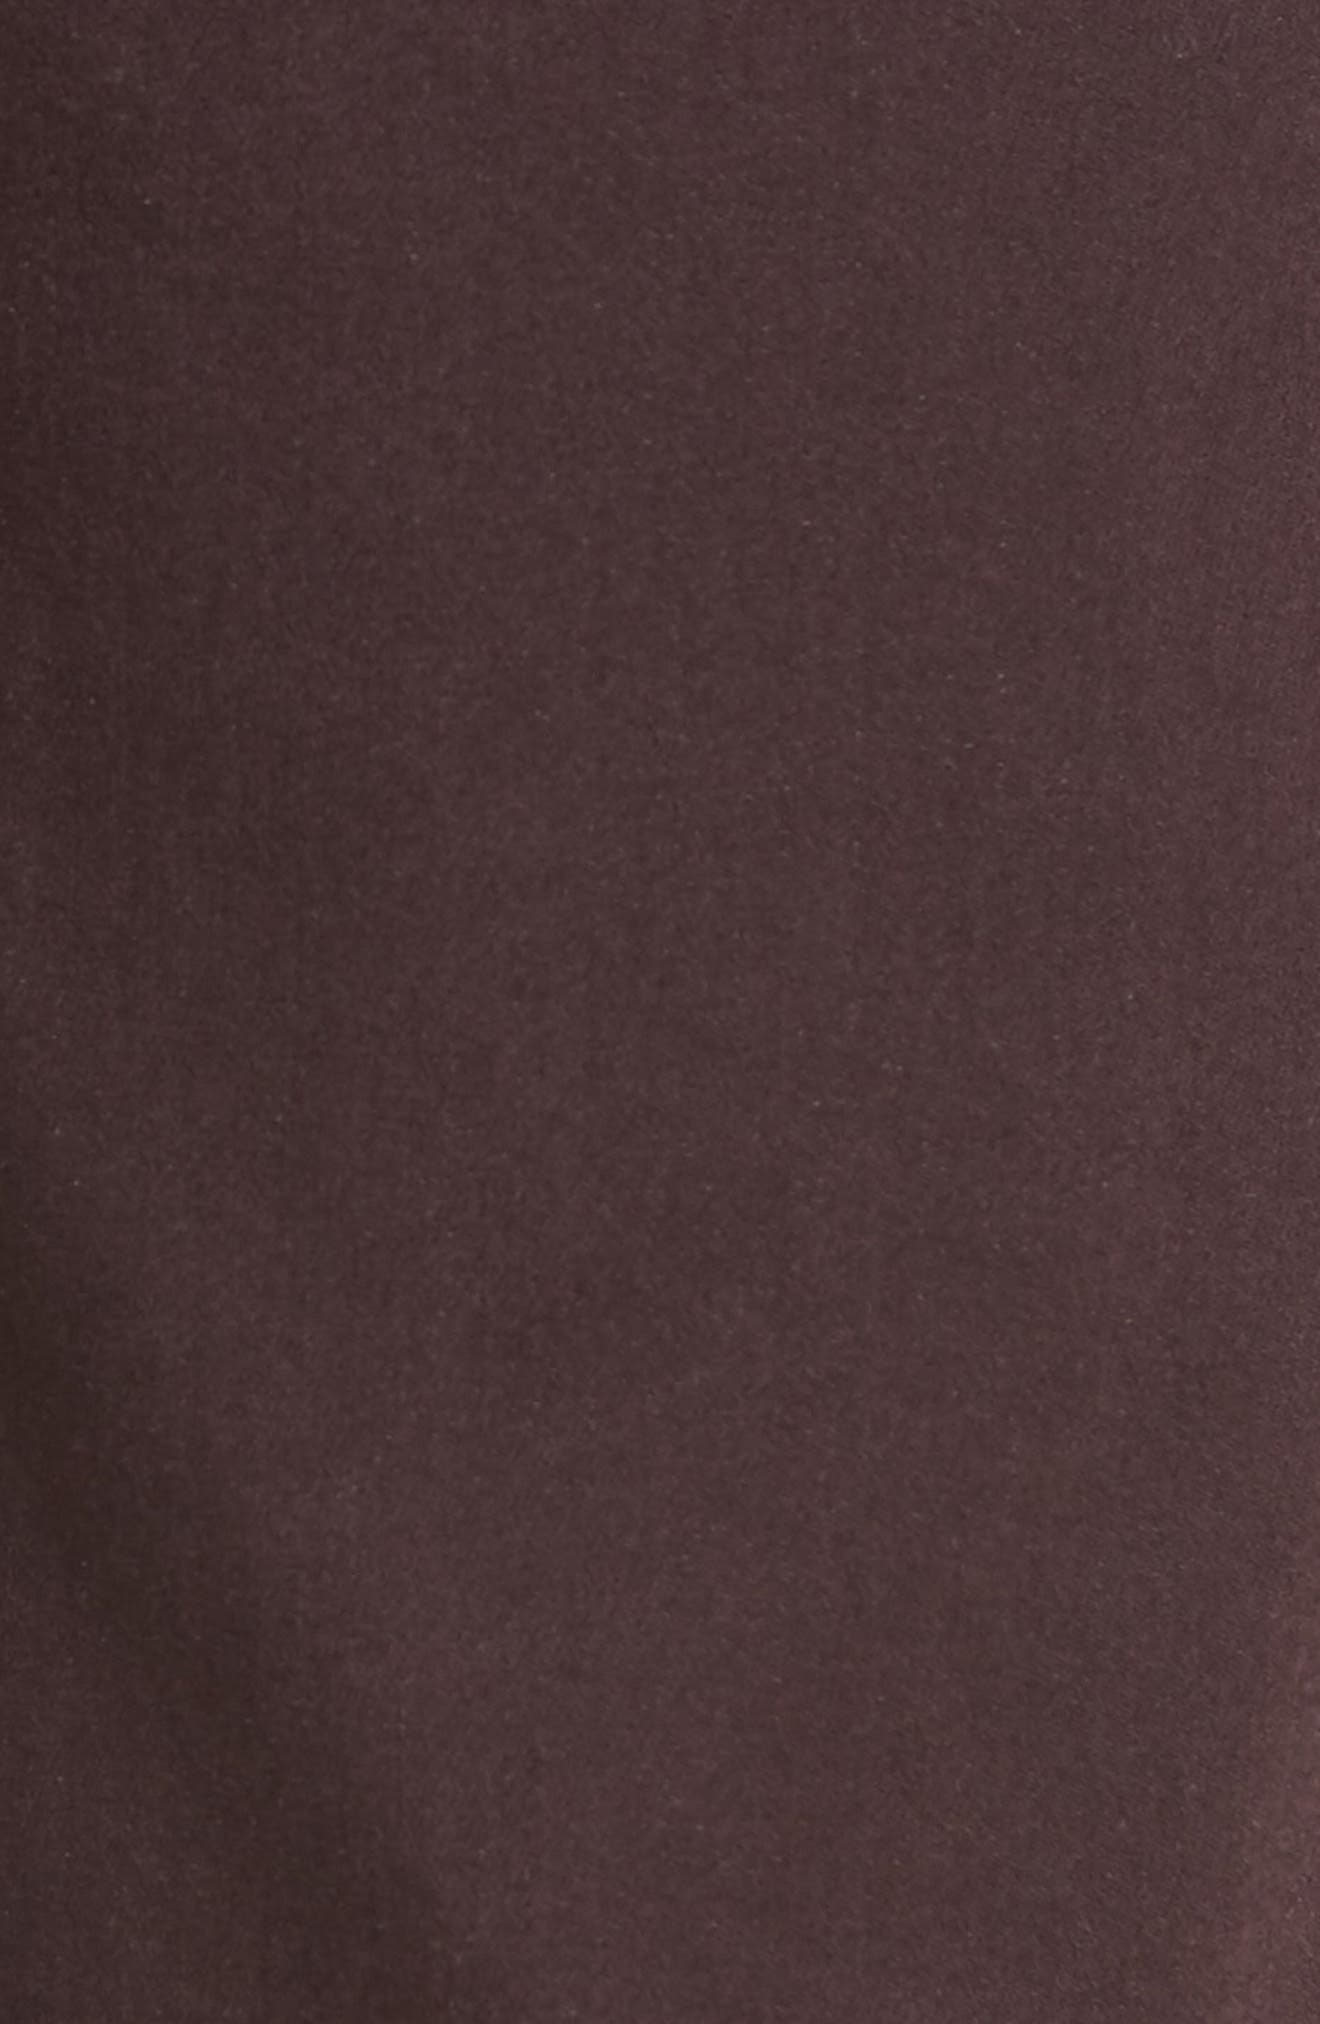 Transcend - Federal Silm Straight Fit Jeans,                             Alternate thumbnail 5, color,                             DARK PORT